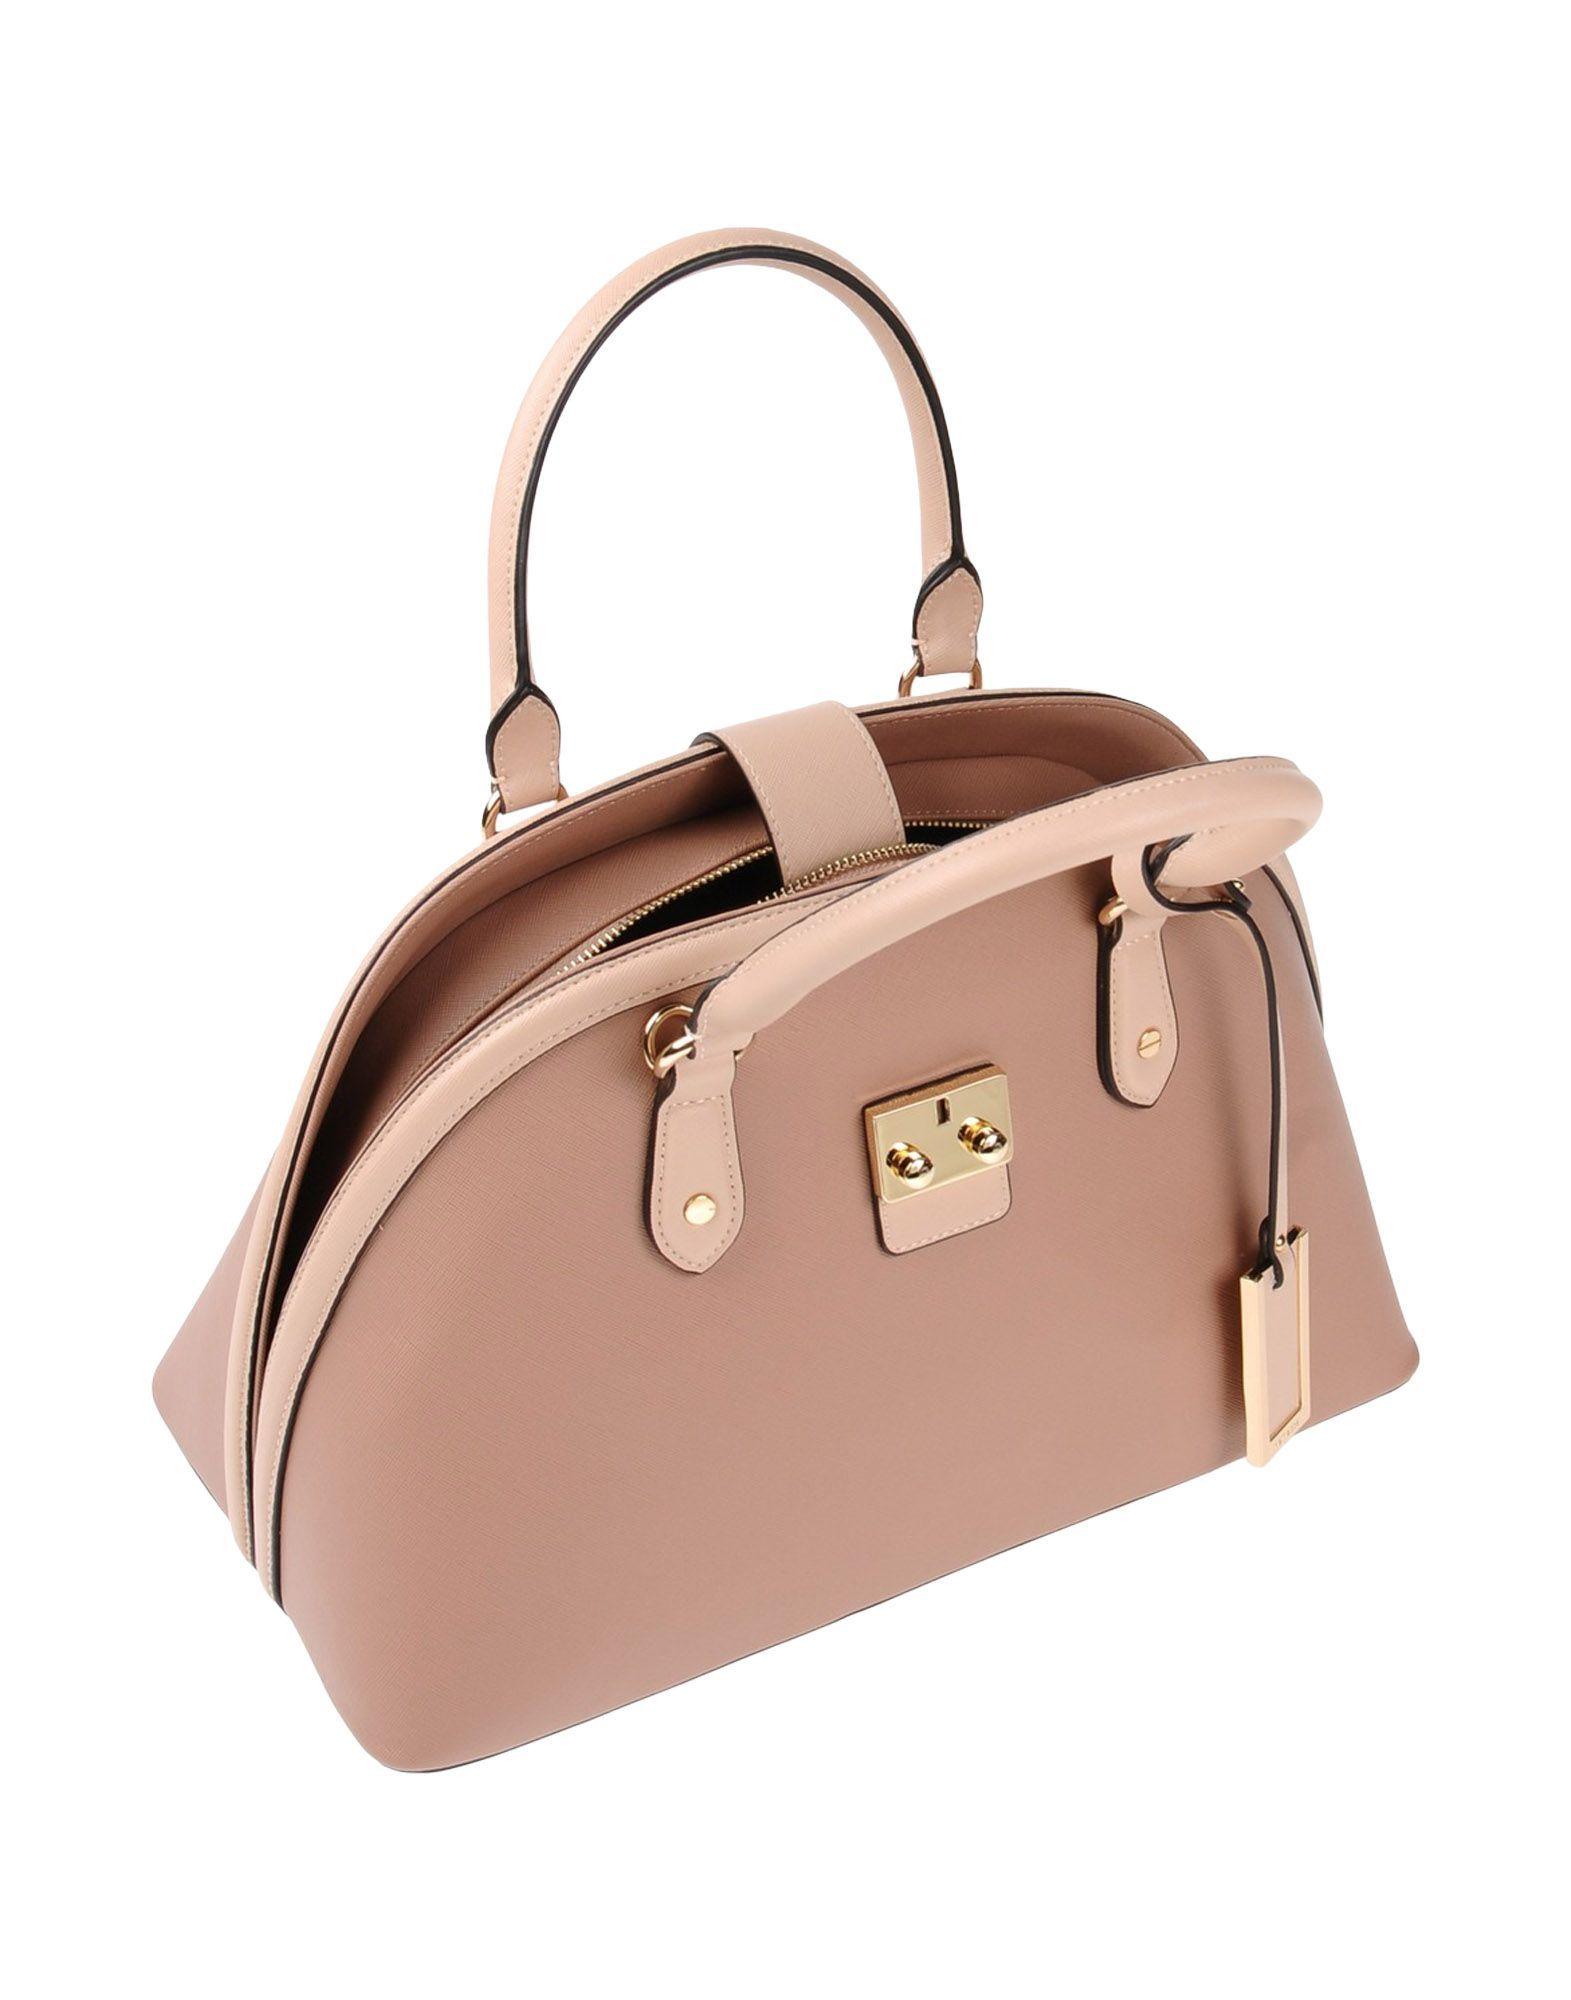 Nenette Pale Pink Faux Leather Top Handle Bag